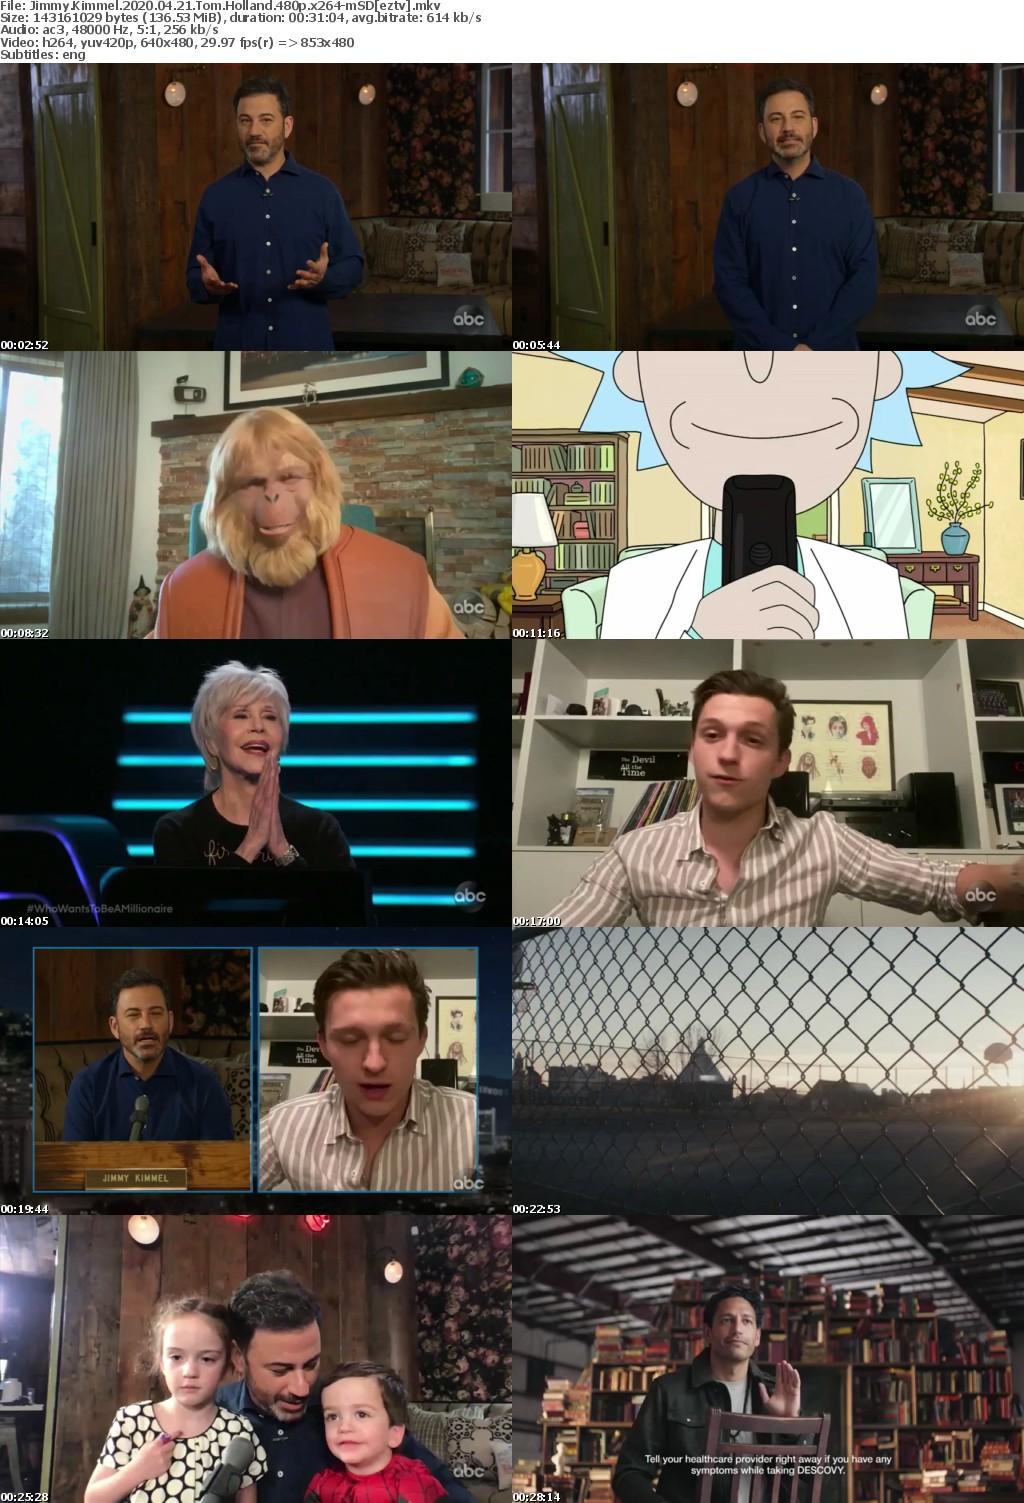 Jimmy Kimmel 2020 04 21 Tom Holland 480p x264-mSD